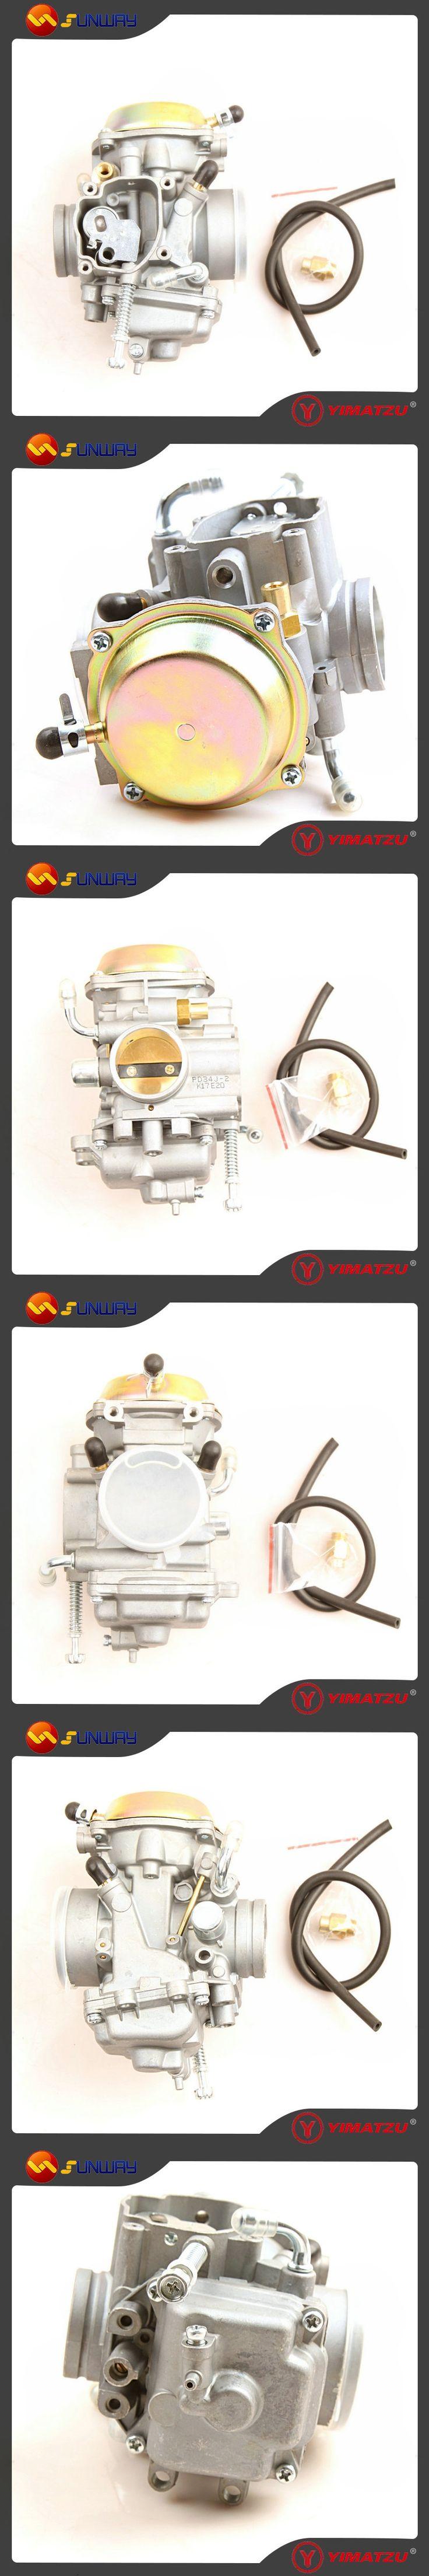 YIMATZU ATV Parts 34mm Carburetor for POLARIS RANGER 500 CARBURETOR 1999 - 2009 ATV Quad Bike Free Shipping